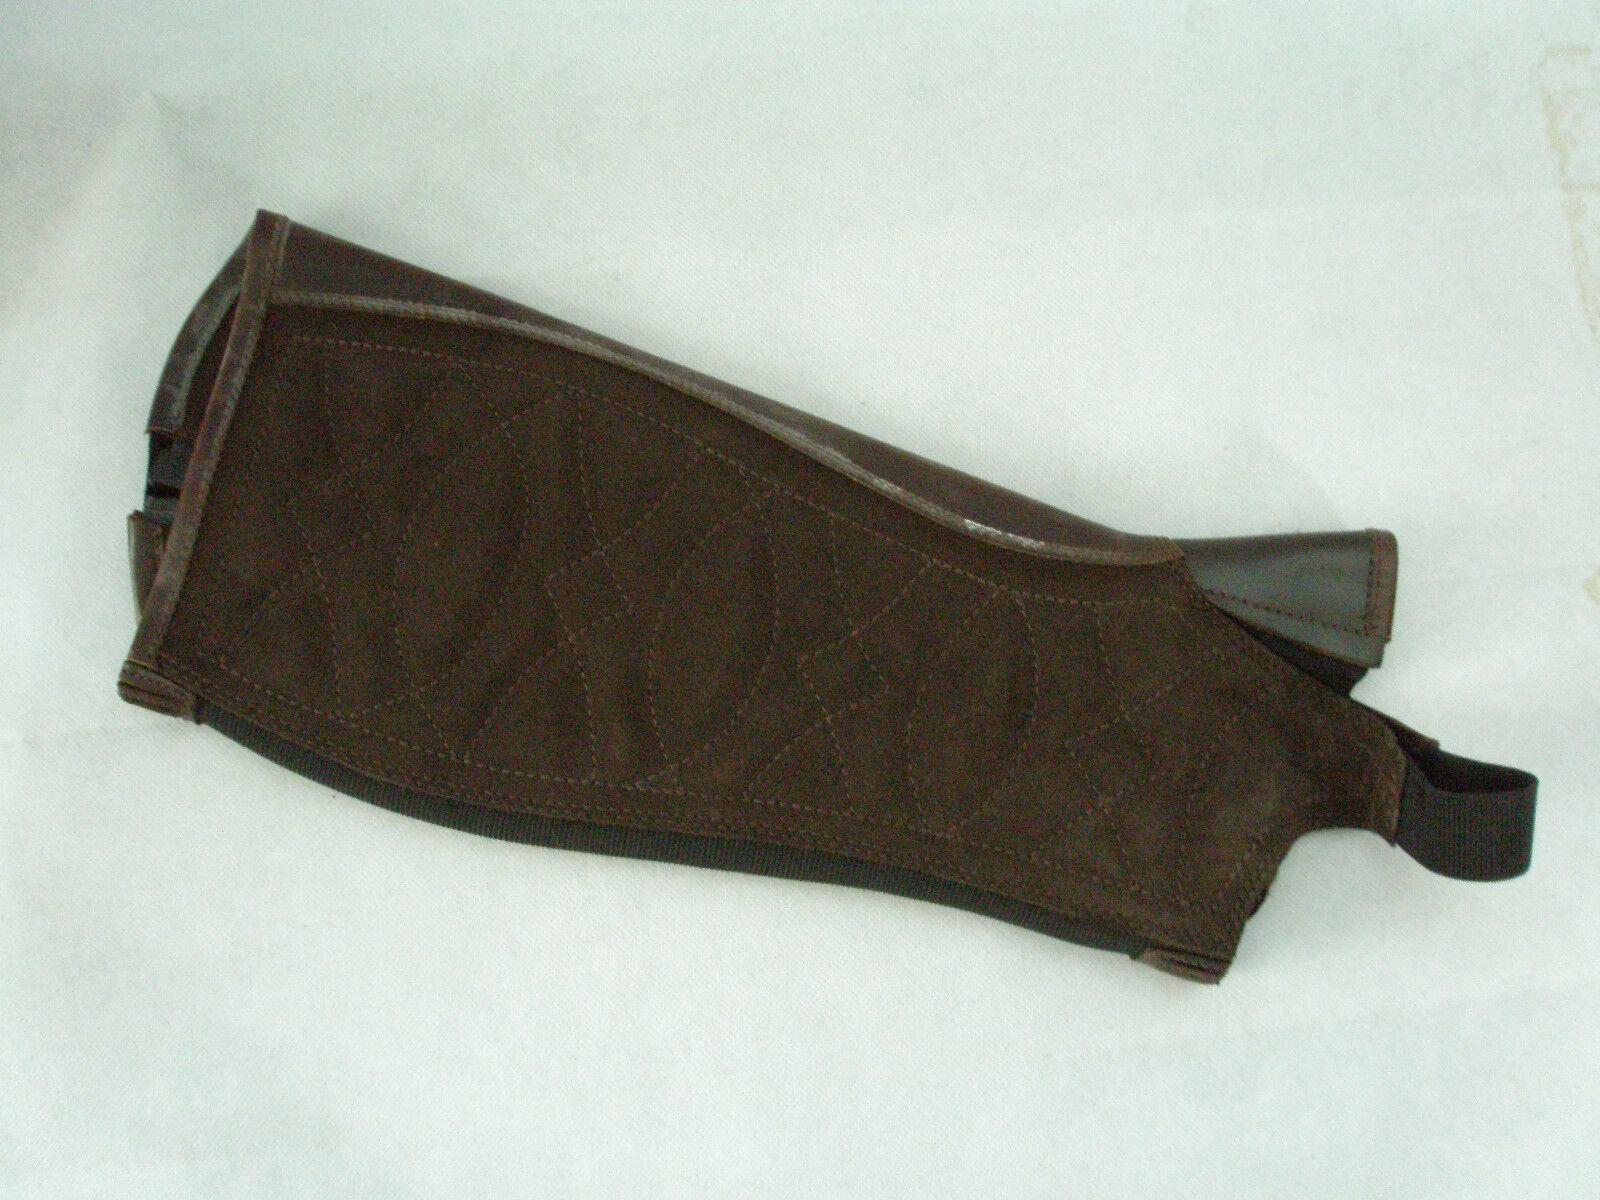 Ariat clásico de de de cuero III medio Chaps Polainas Negro Chocolate 417ef3